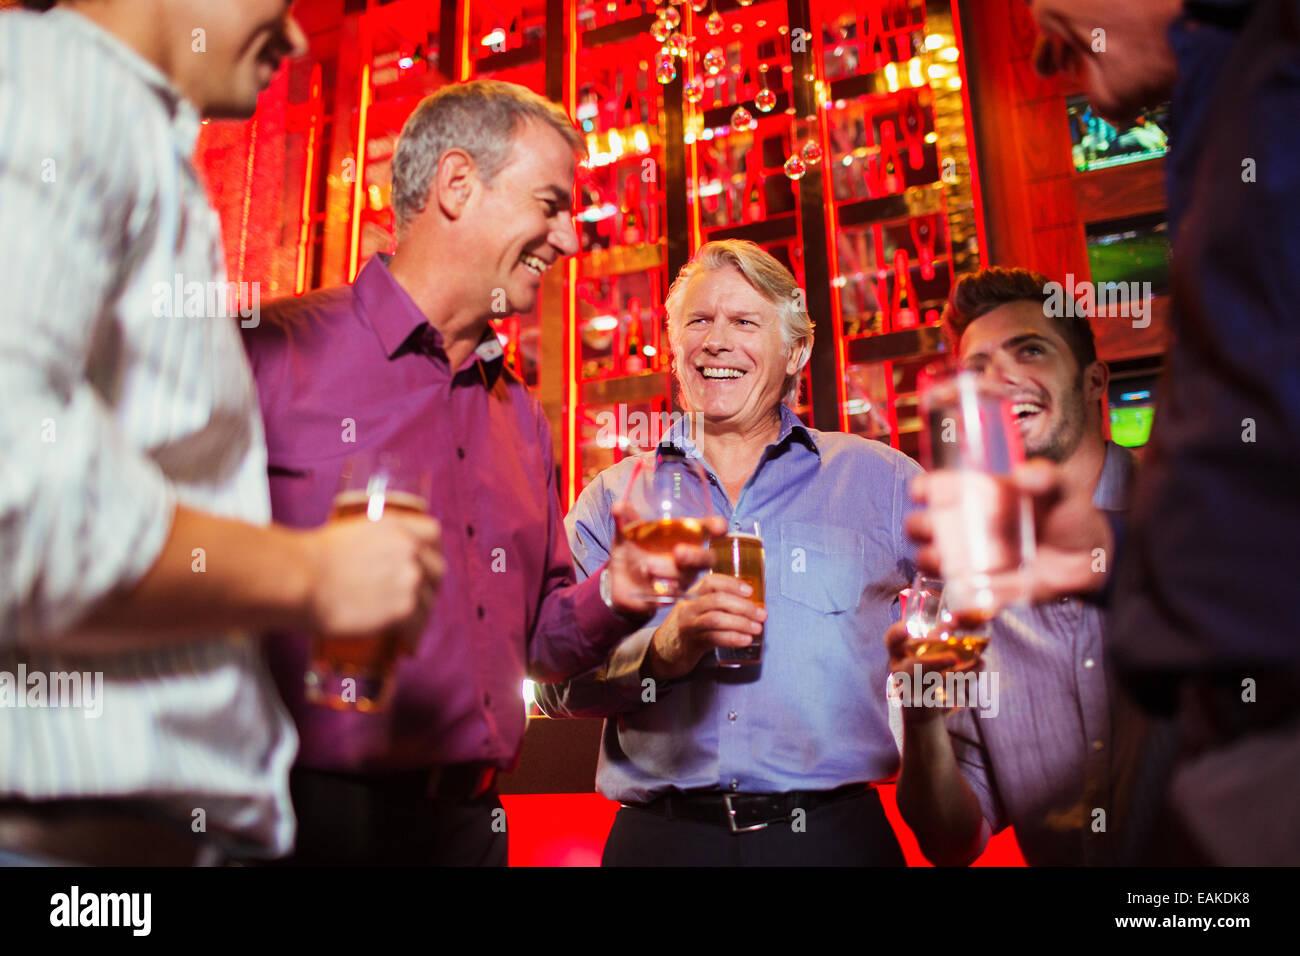 Group of smiling men having drink in bar - Stock Image